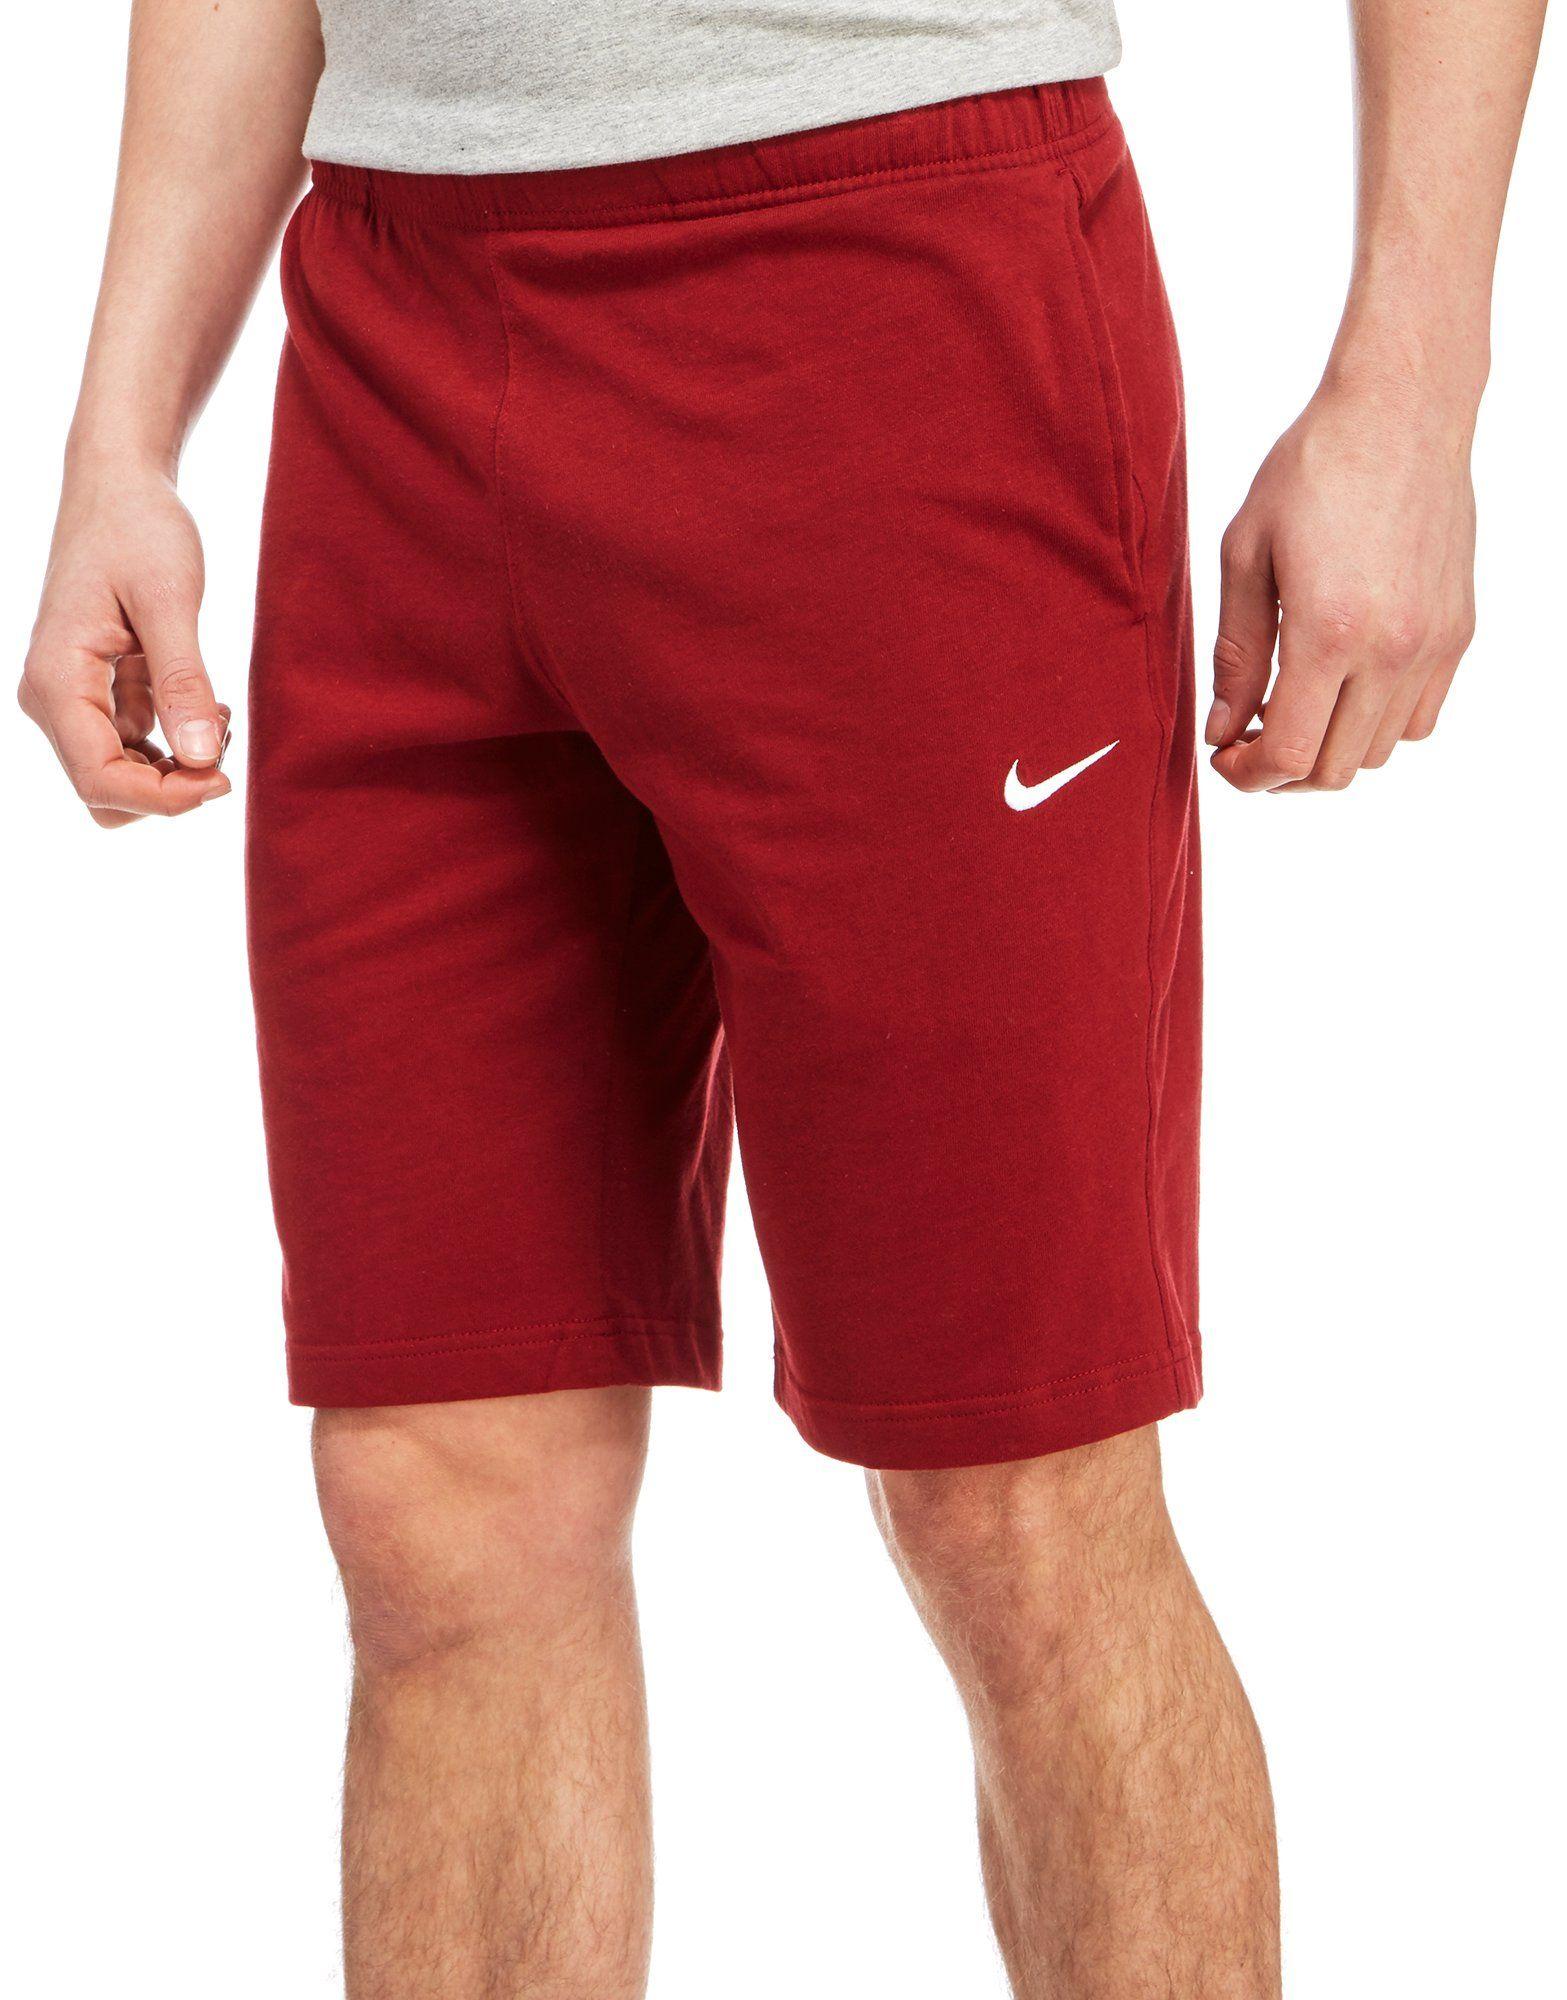 newest 5be79 2616e Nike Foundation Shorts   JD Sports free shipping